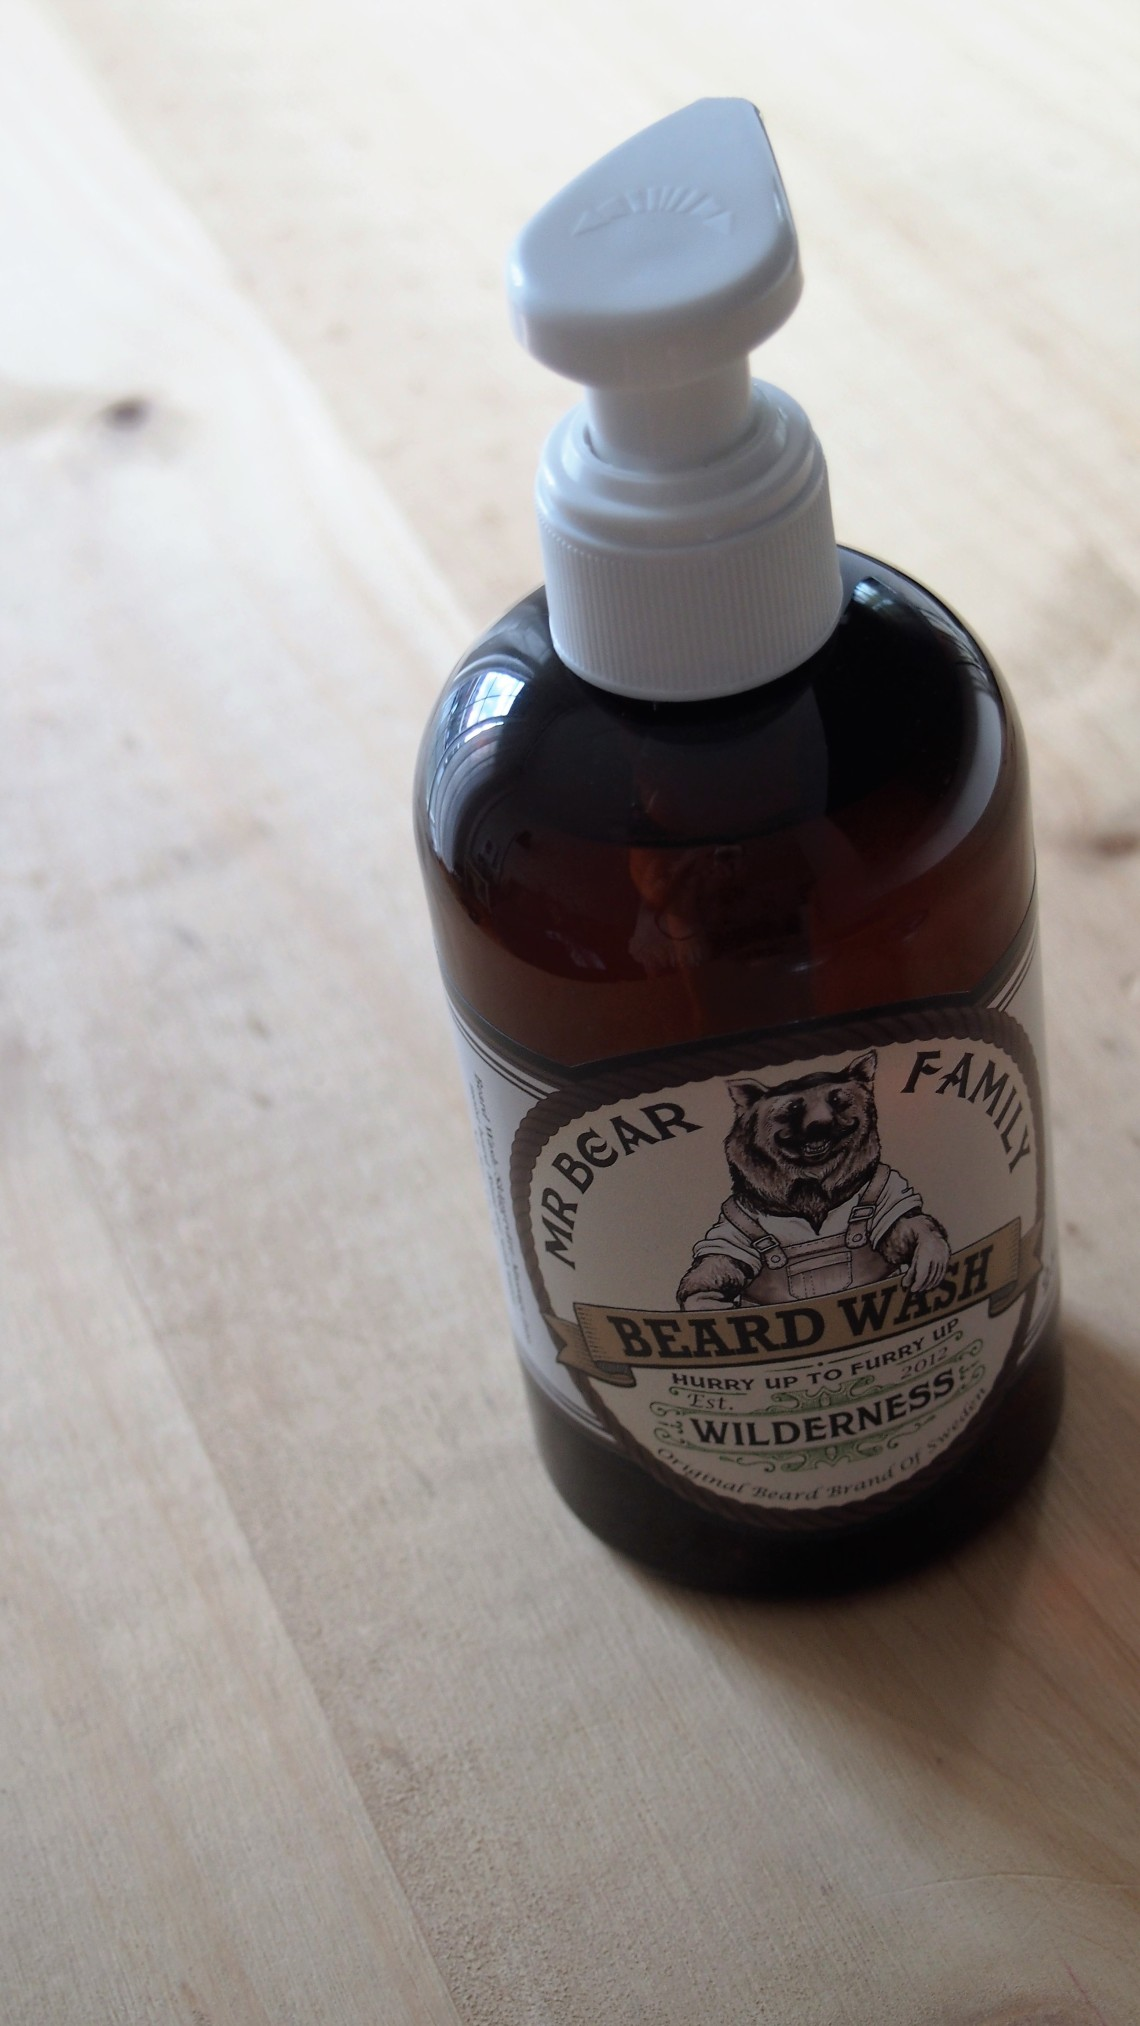 mr-bear-family-cepillo-para-la-barba